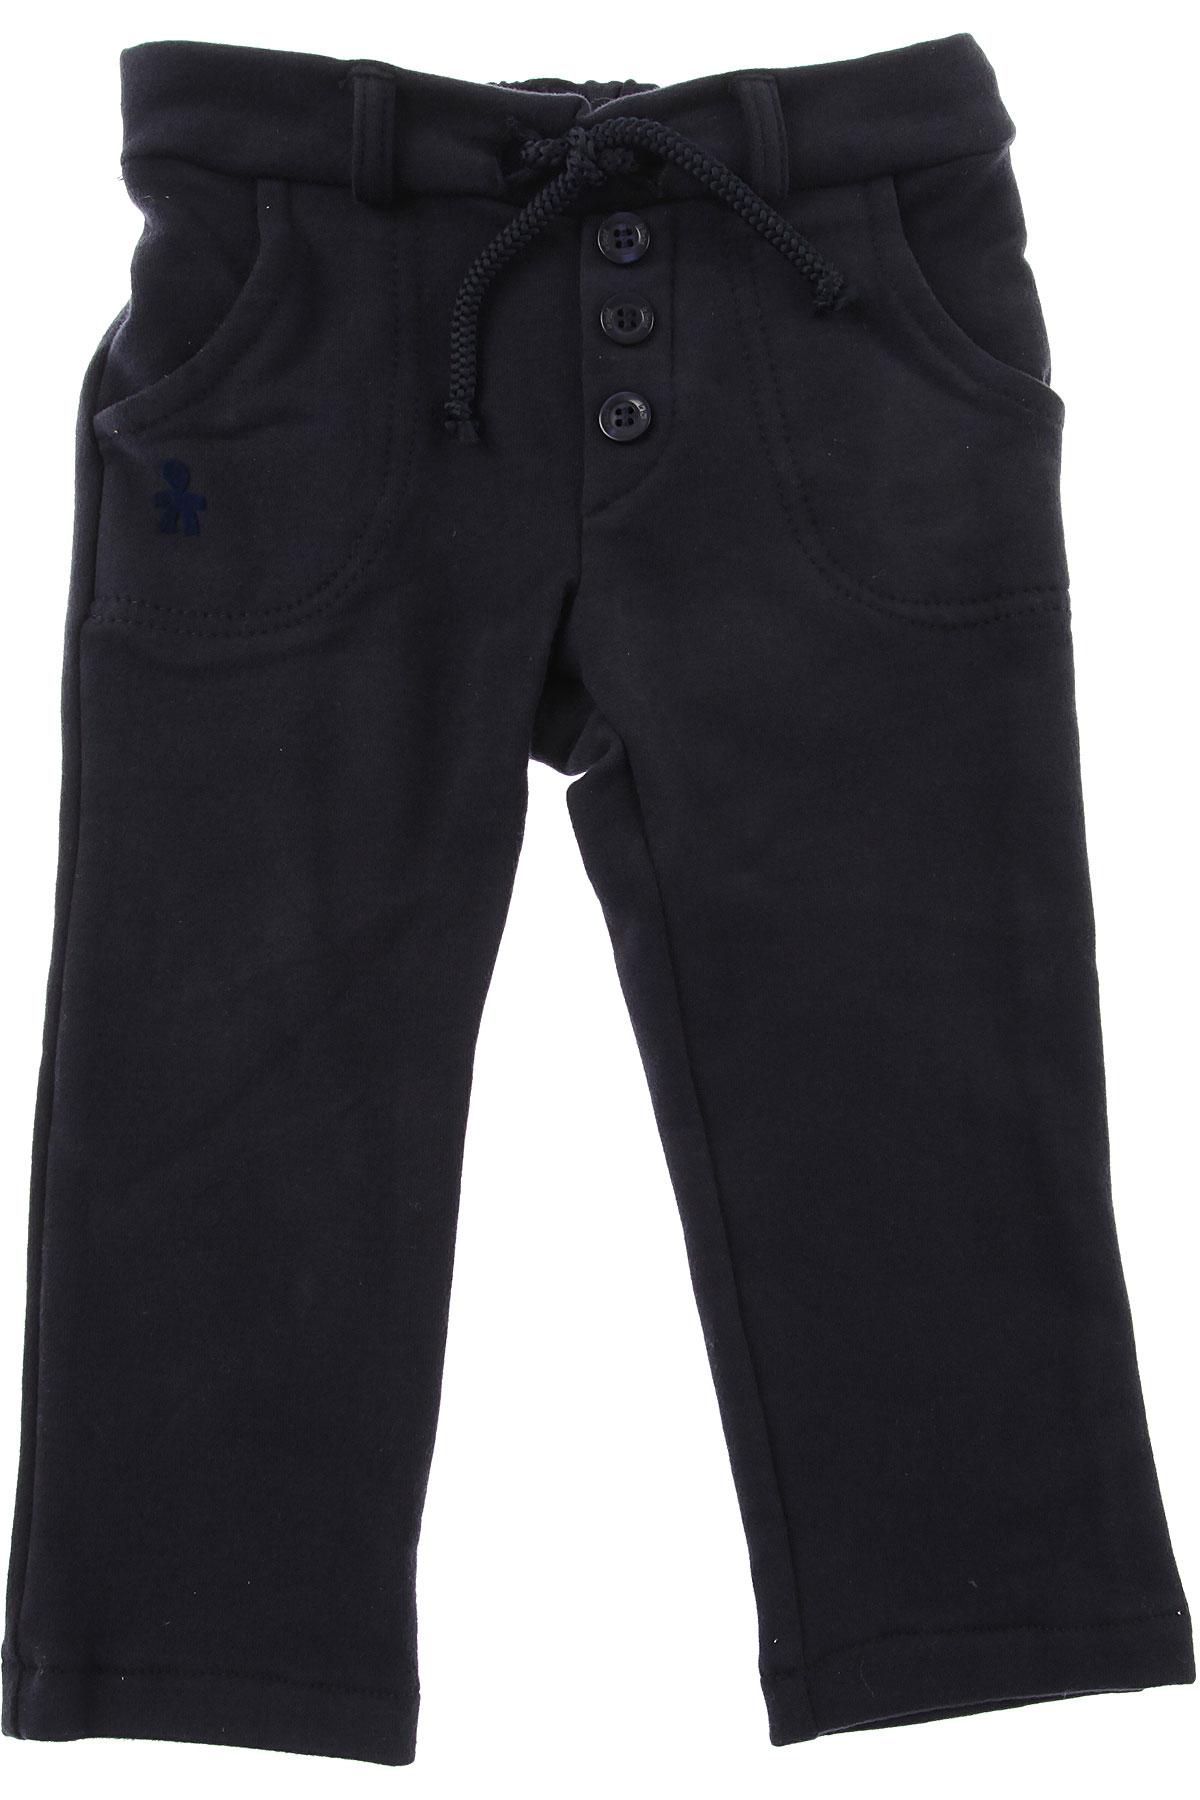 Image of Le Bebe Baby Pants for Girls, Blue, Cotton, 2017, 12M 18M 6M 9M